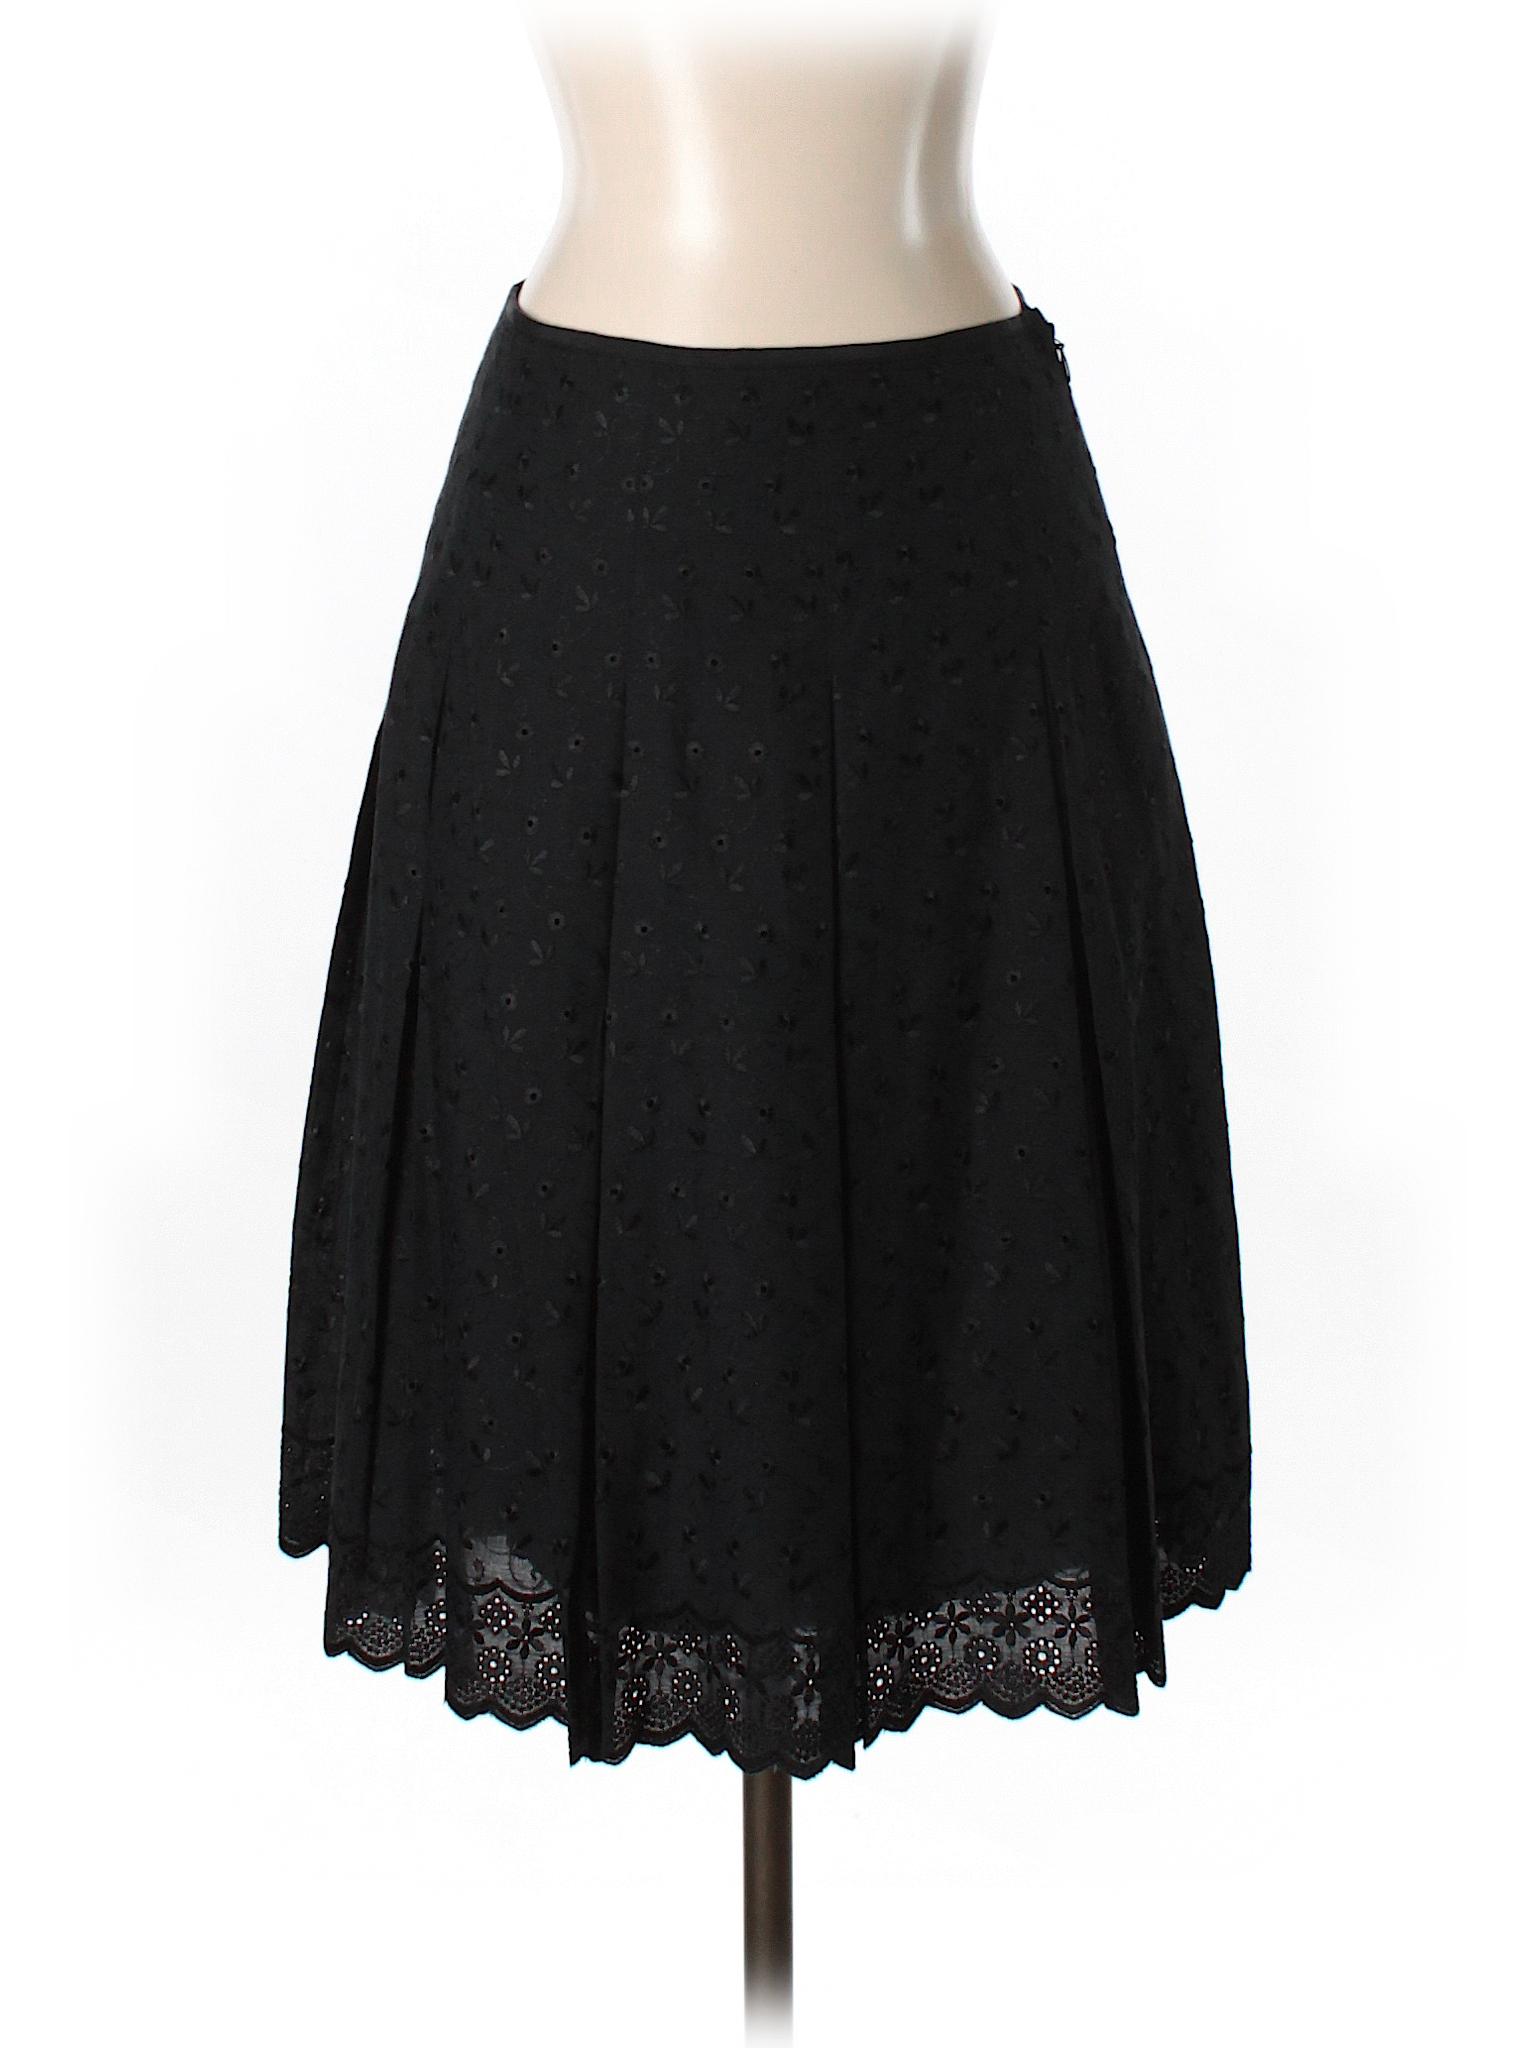 Skirt Casual Boutique Boutique Casual EqnHtvnxw0